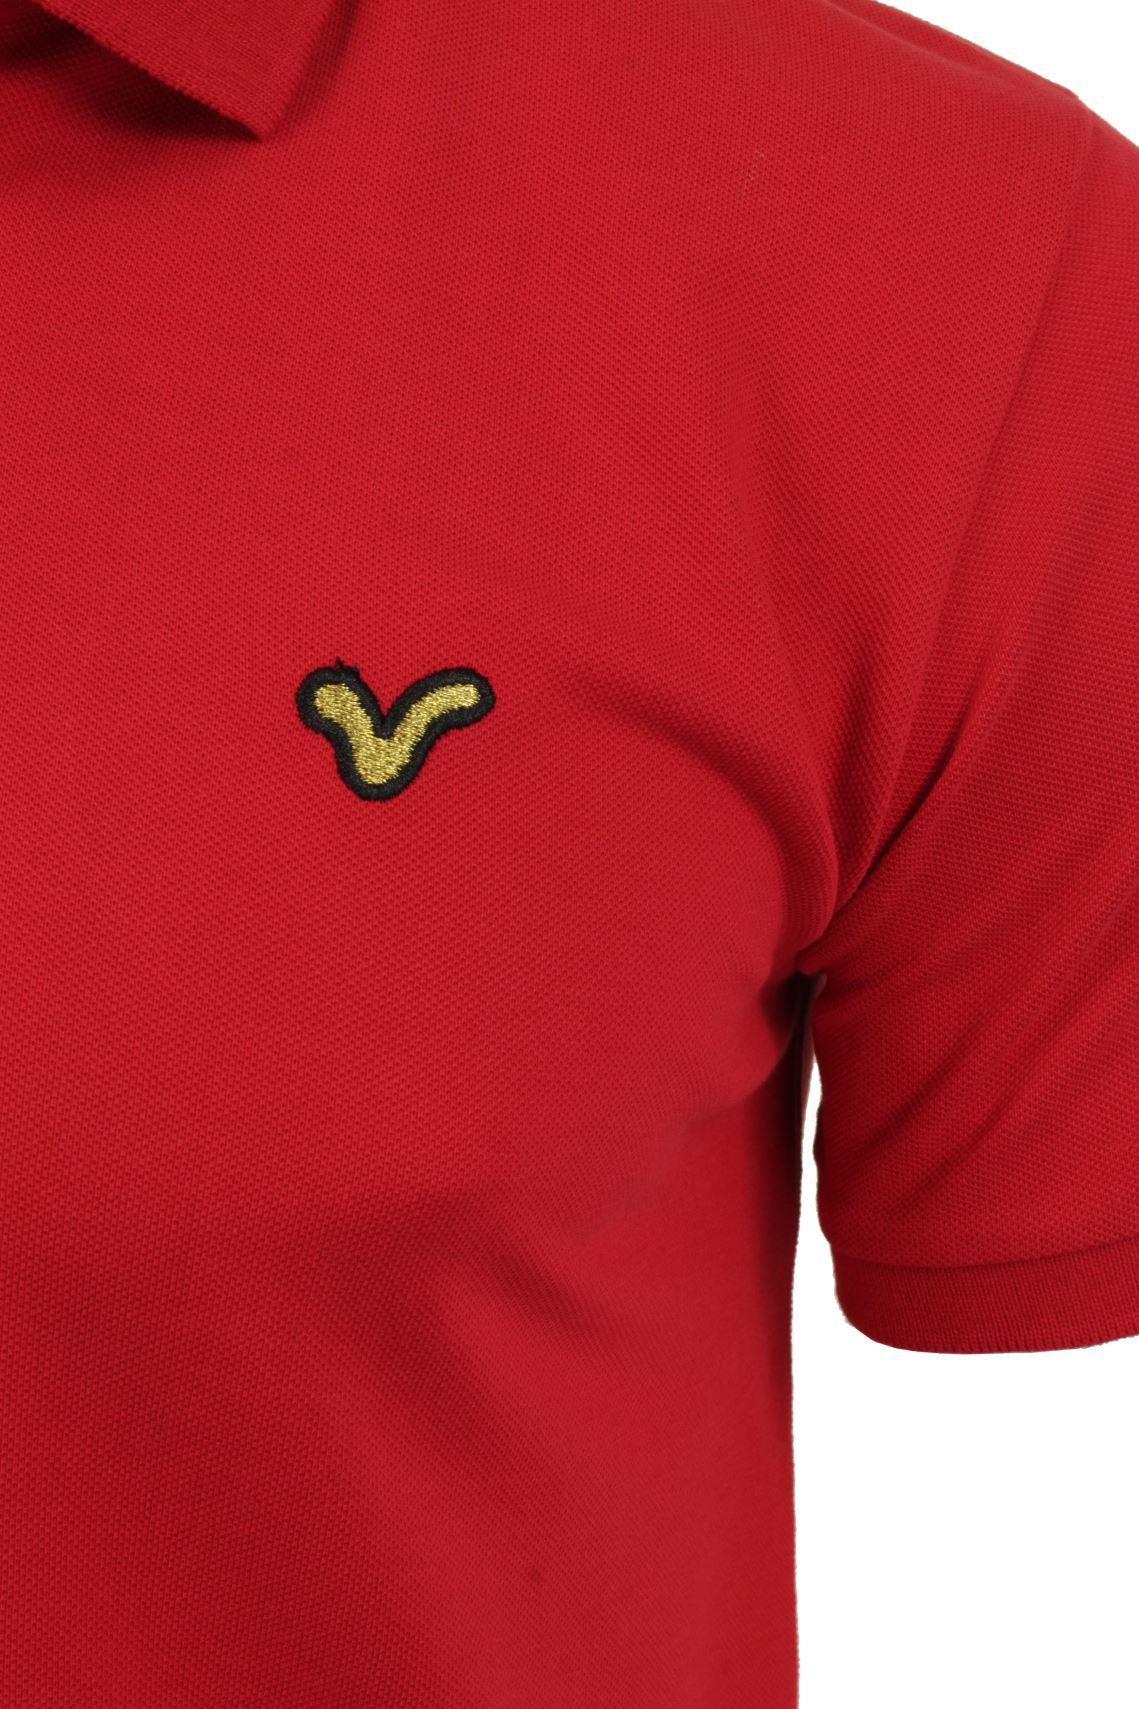 Voi-Jeans-Mens-Fashion-Polo-Shirt-Redford-Short-Sleeved thumbnail 7